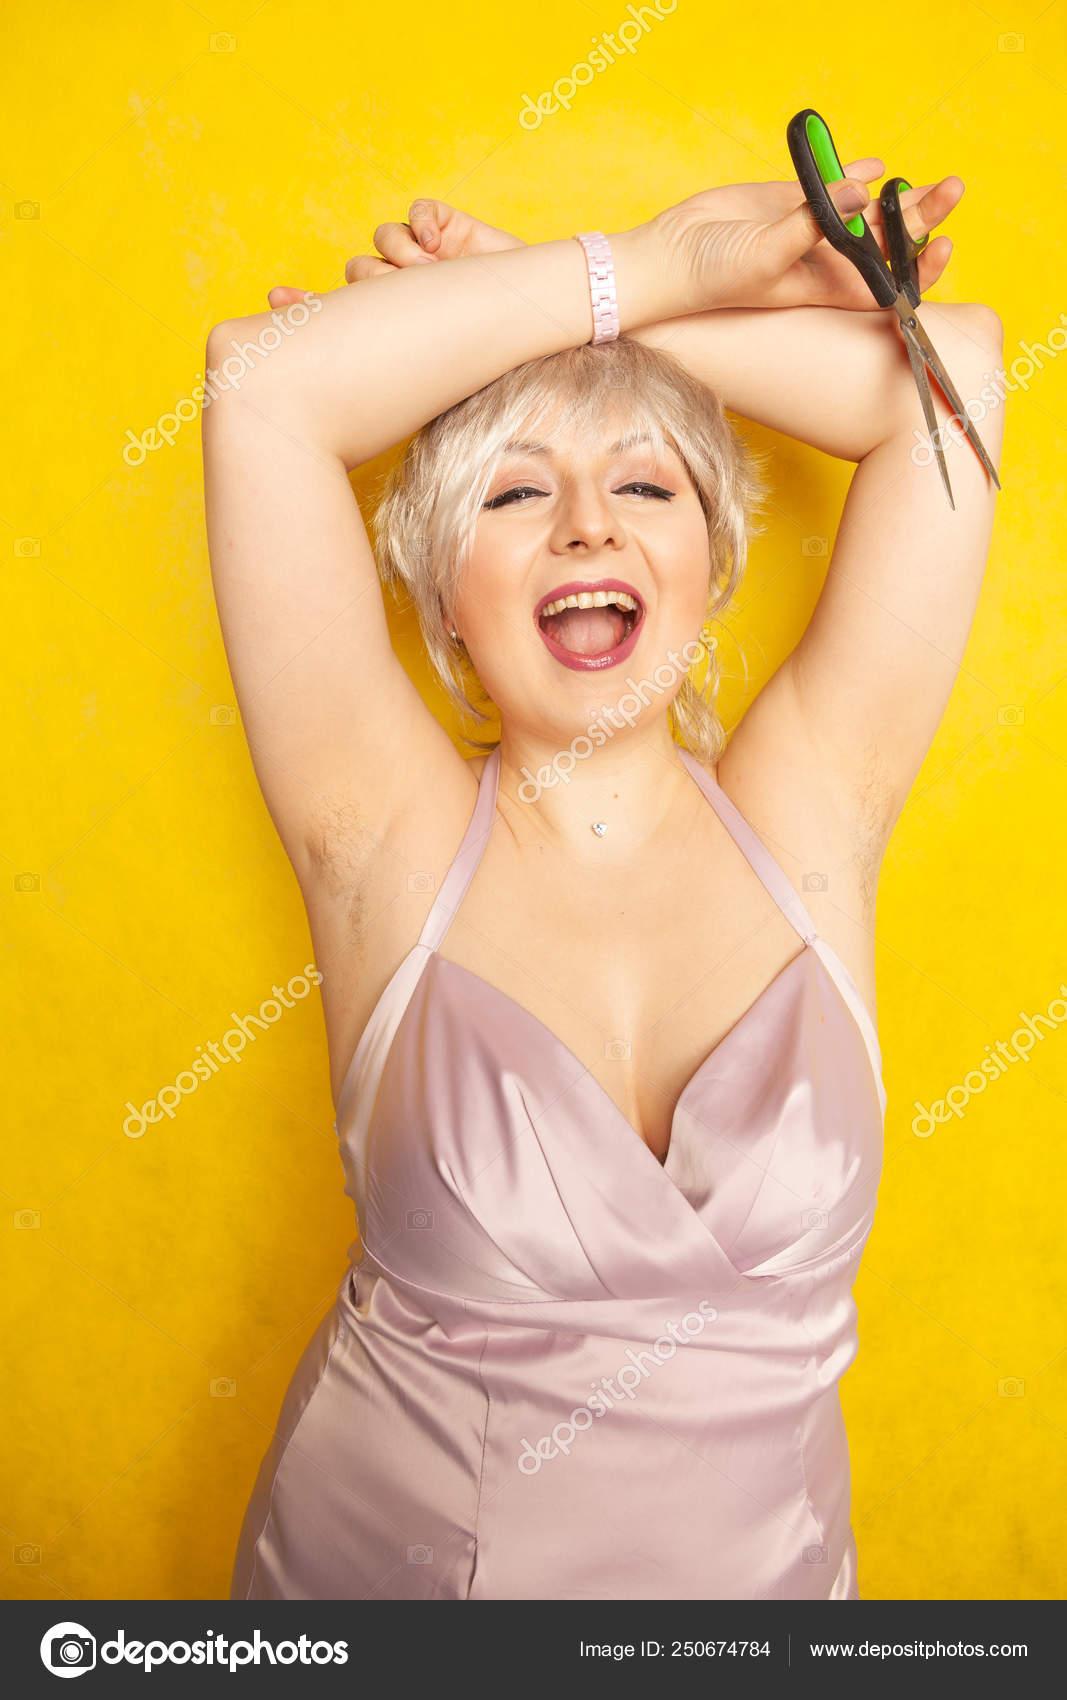 Chubby Girl Dress Unshaven Hairy Armpits Scissors Hand ...